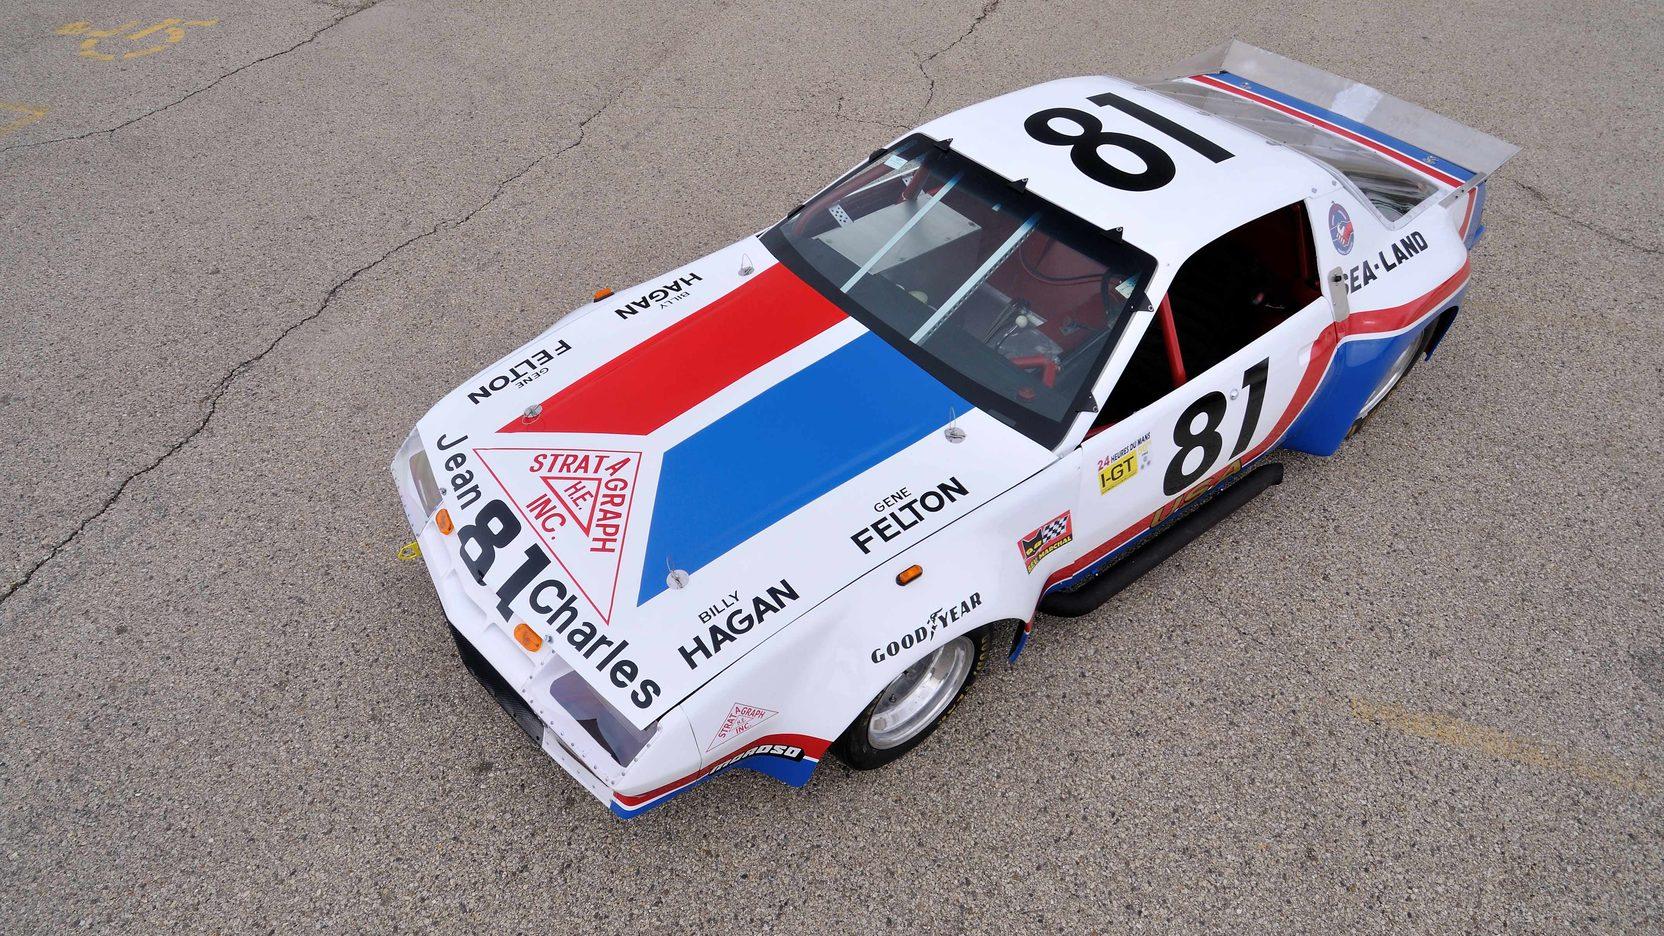 1982 Chevrolet Camaro Le Mans Race Car overhead